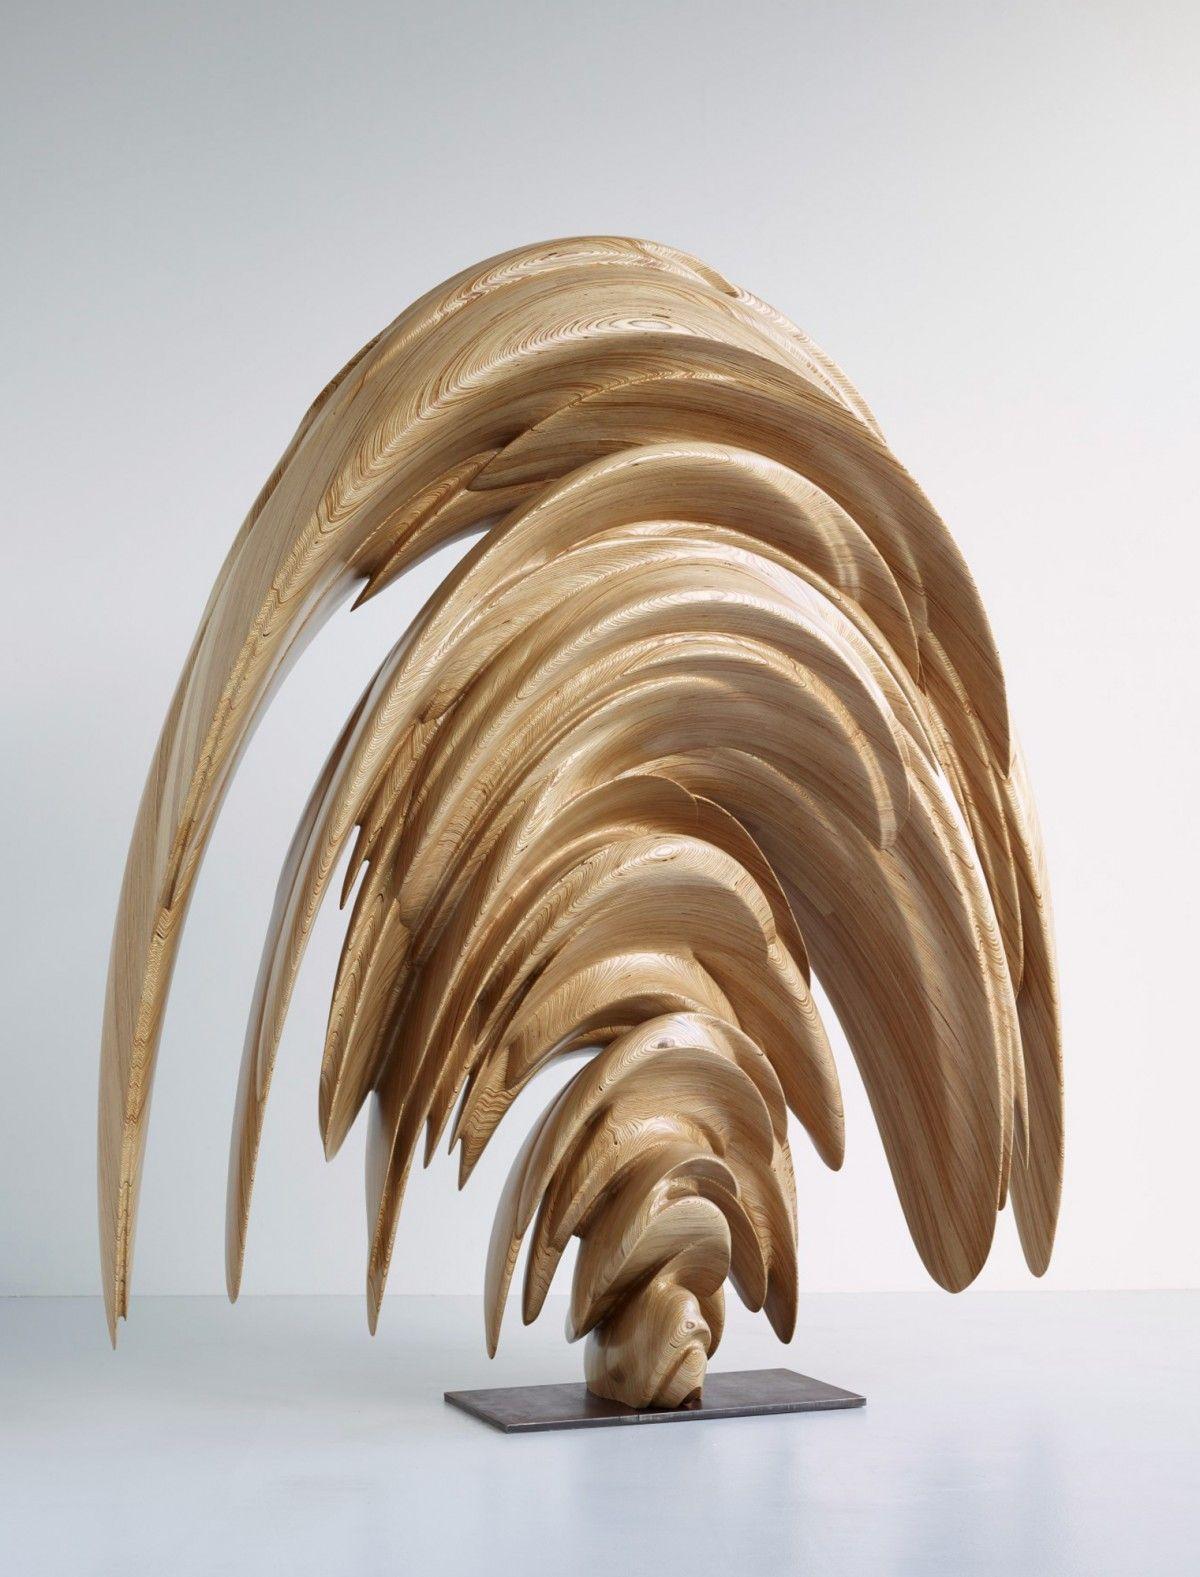 sculpture facts